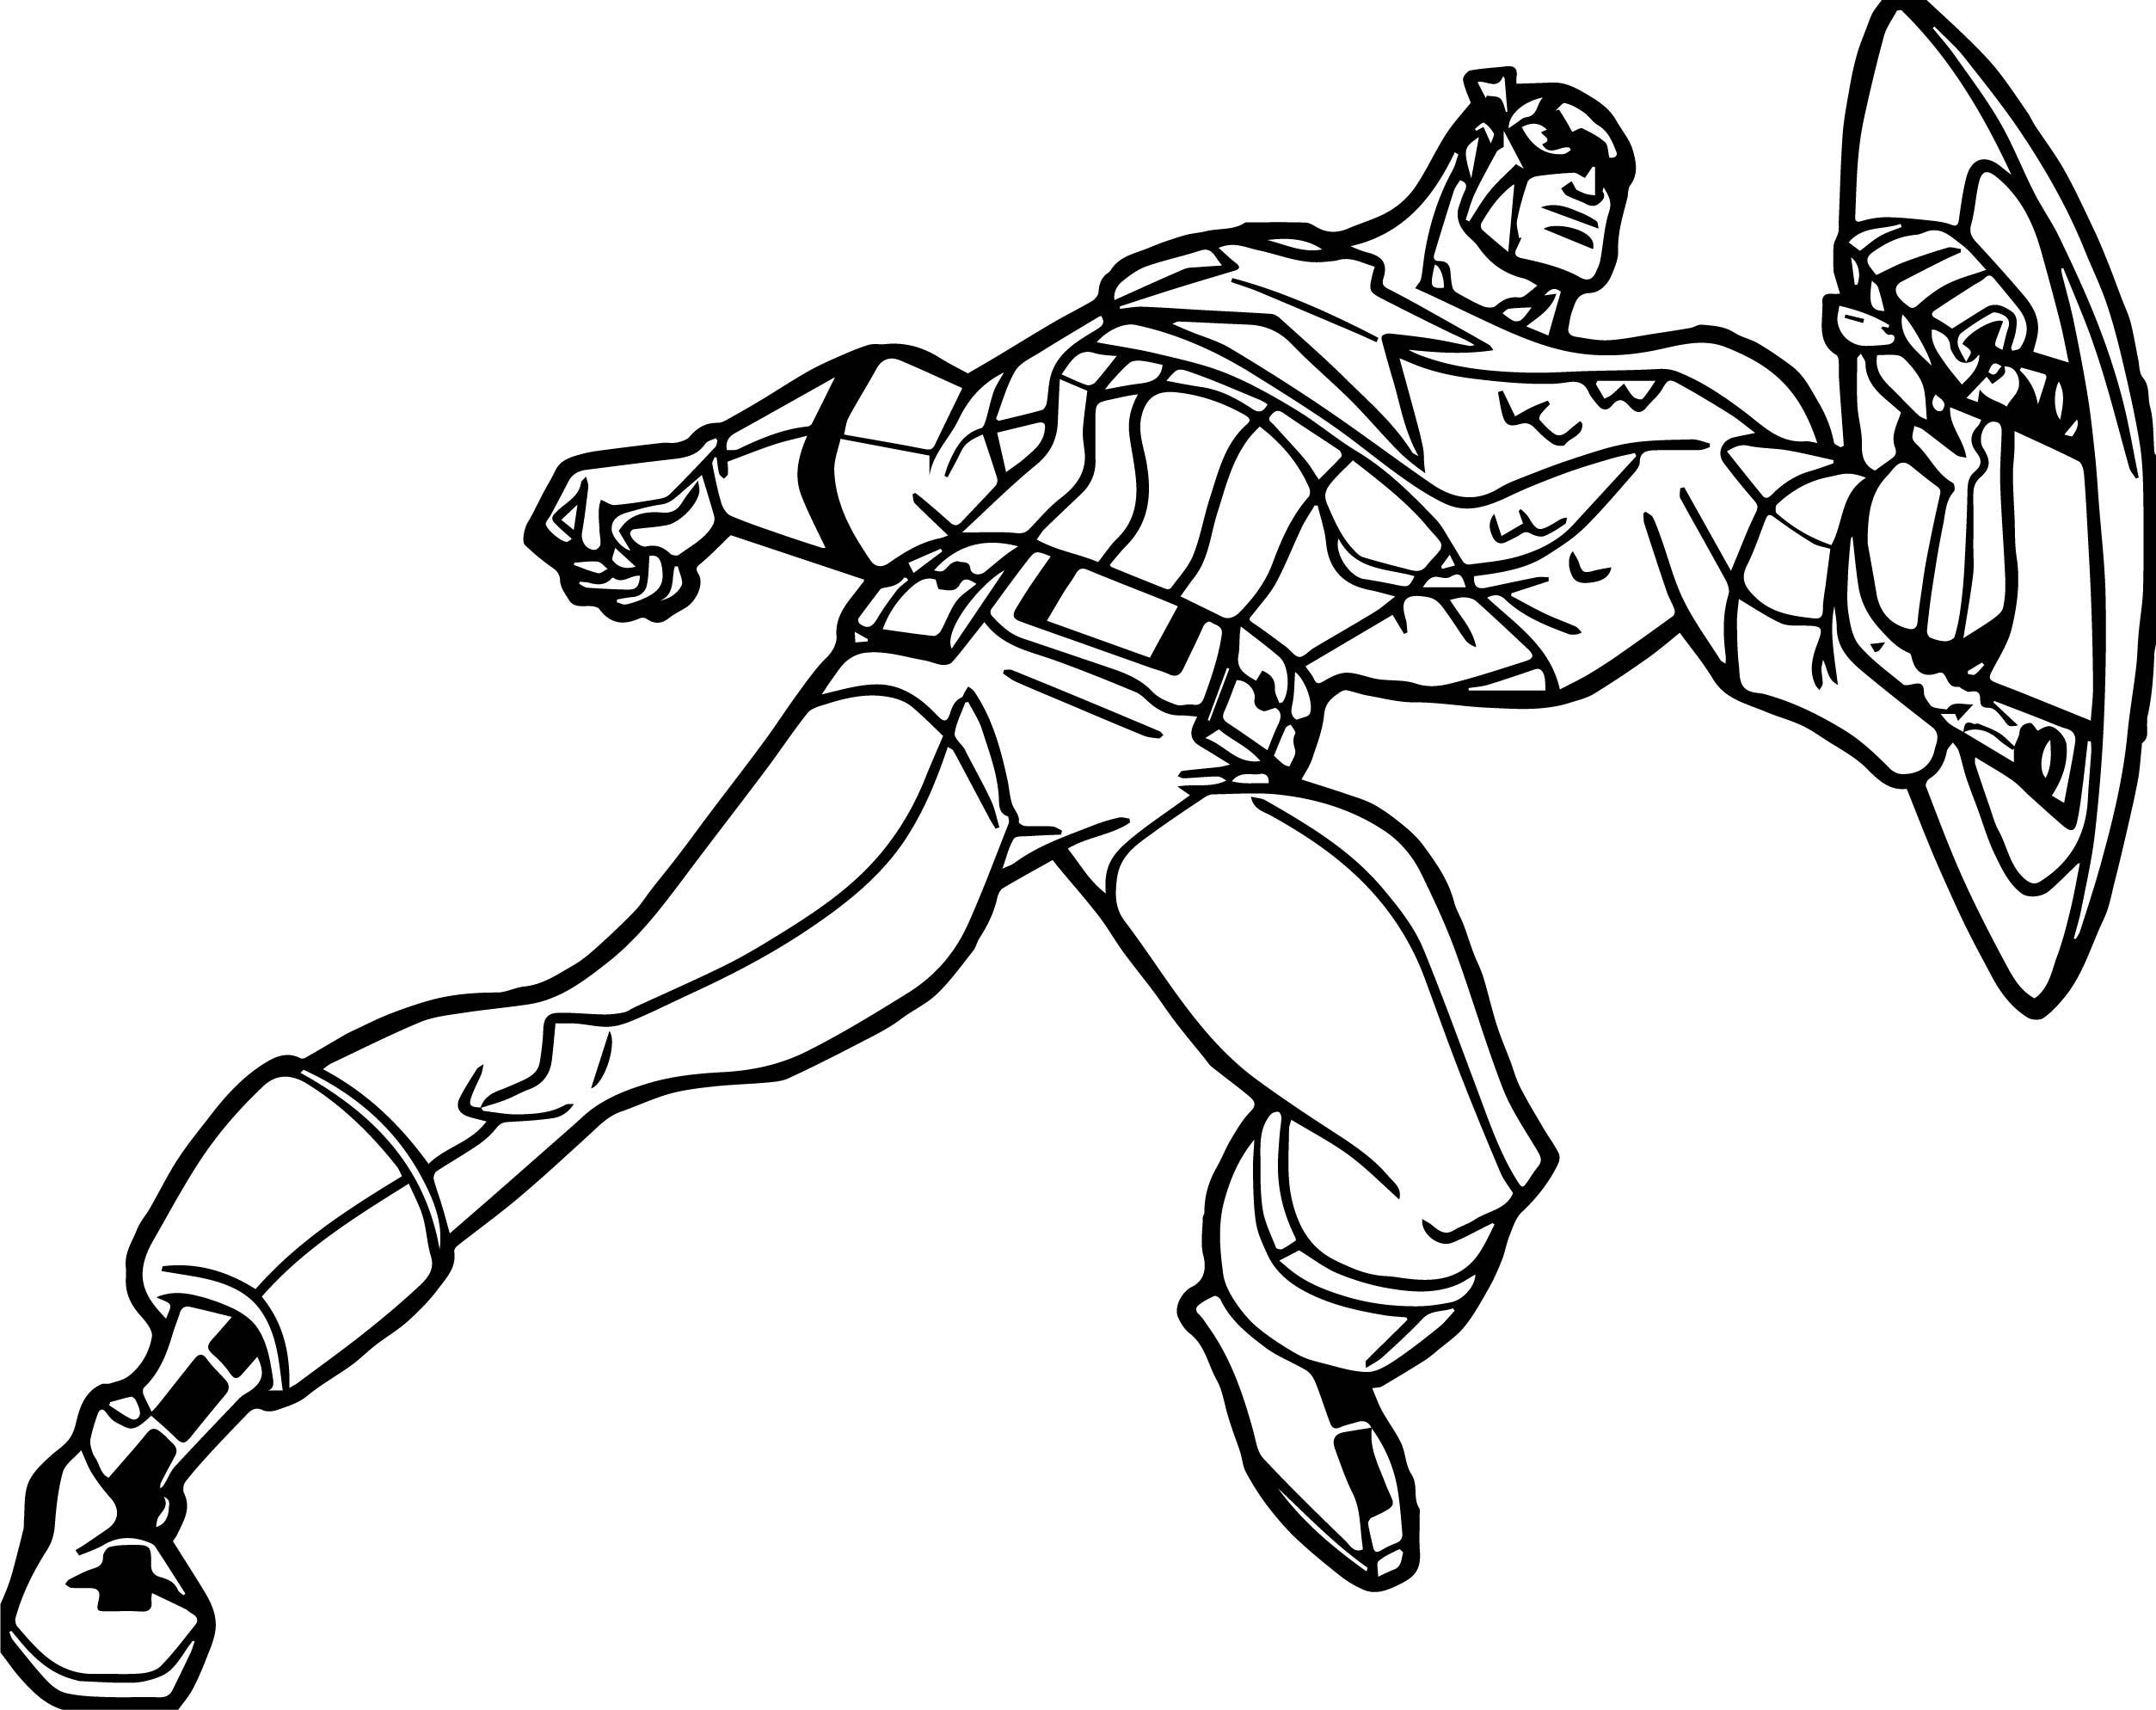 Captain Guard Coloring Page